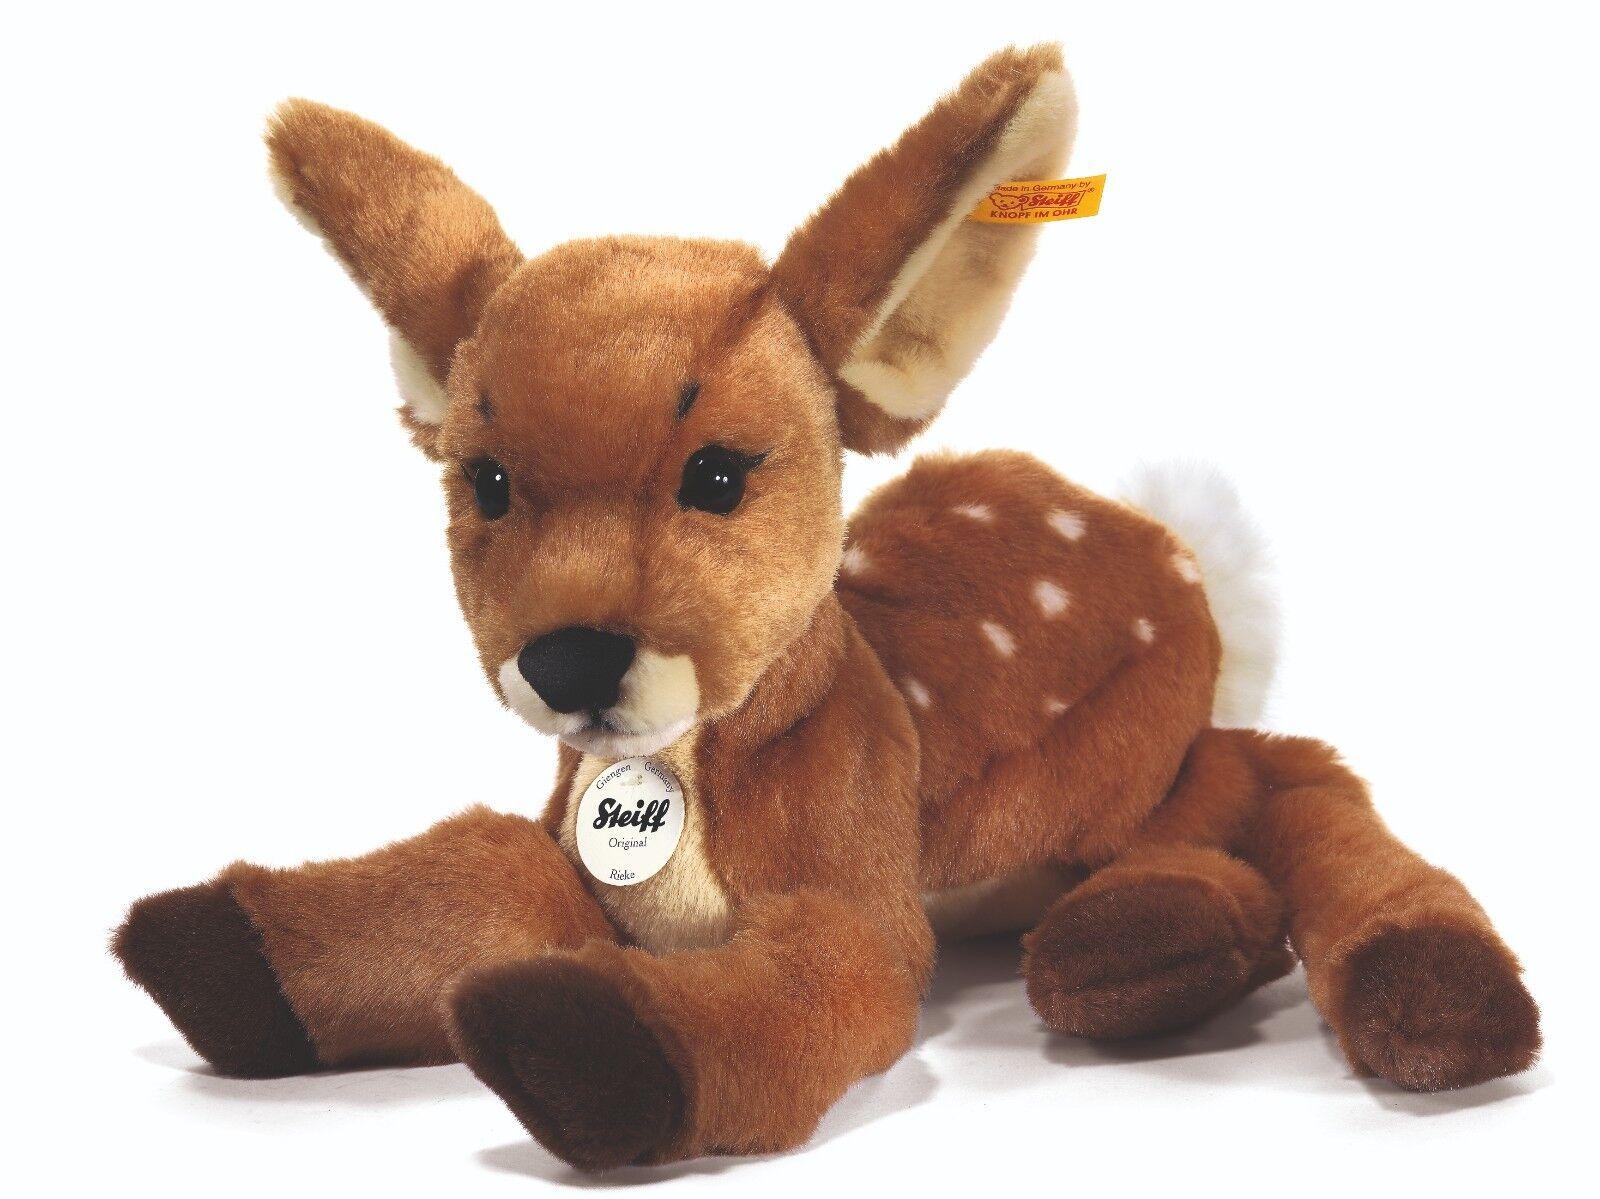 Steiff Rieke Fawn / deer classic plush washable soft toy - 35cm - EAN 070433